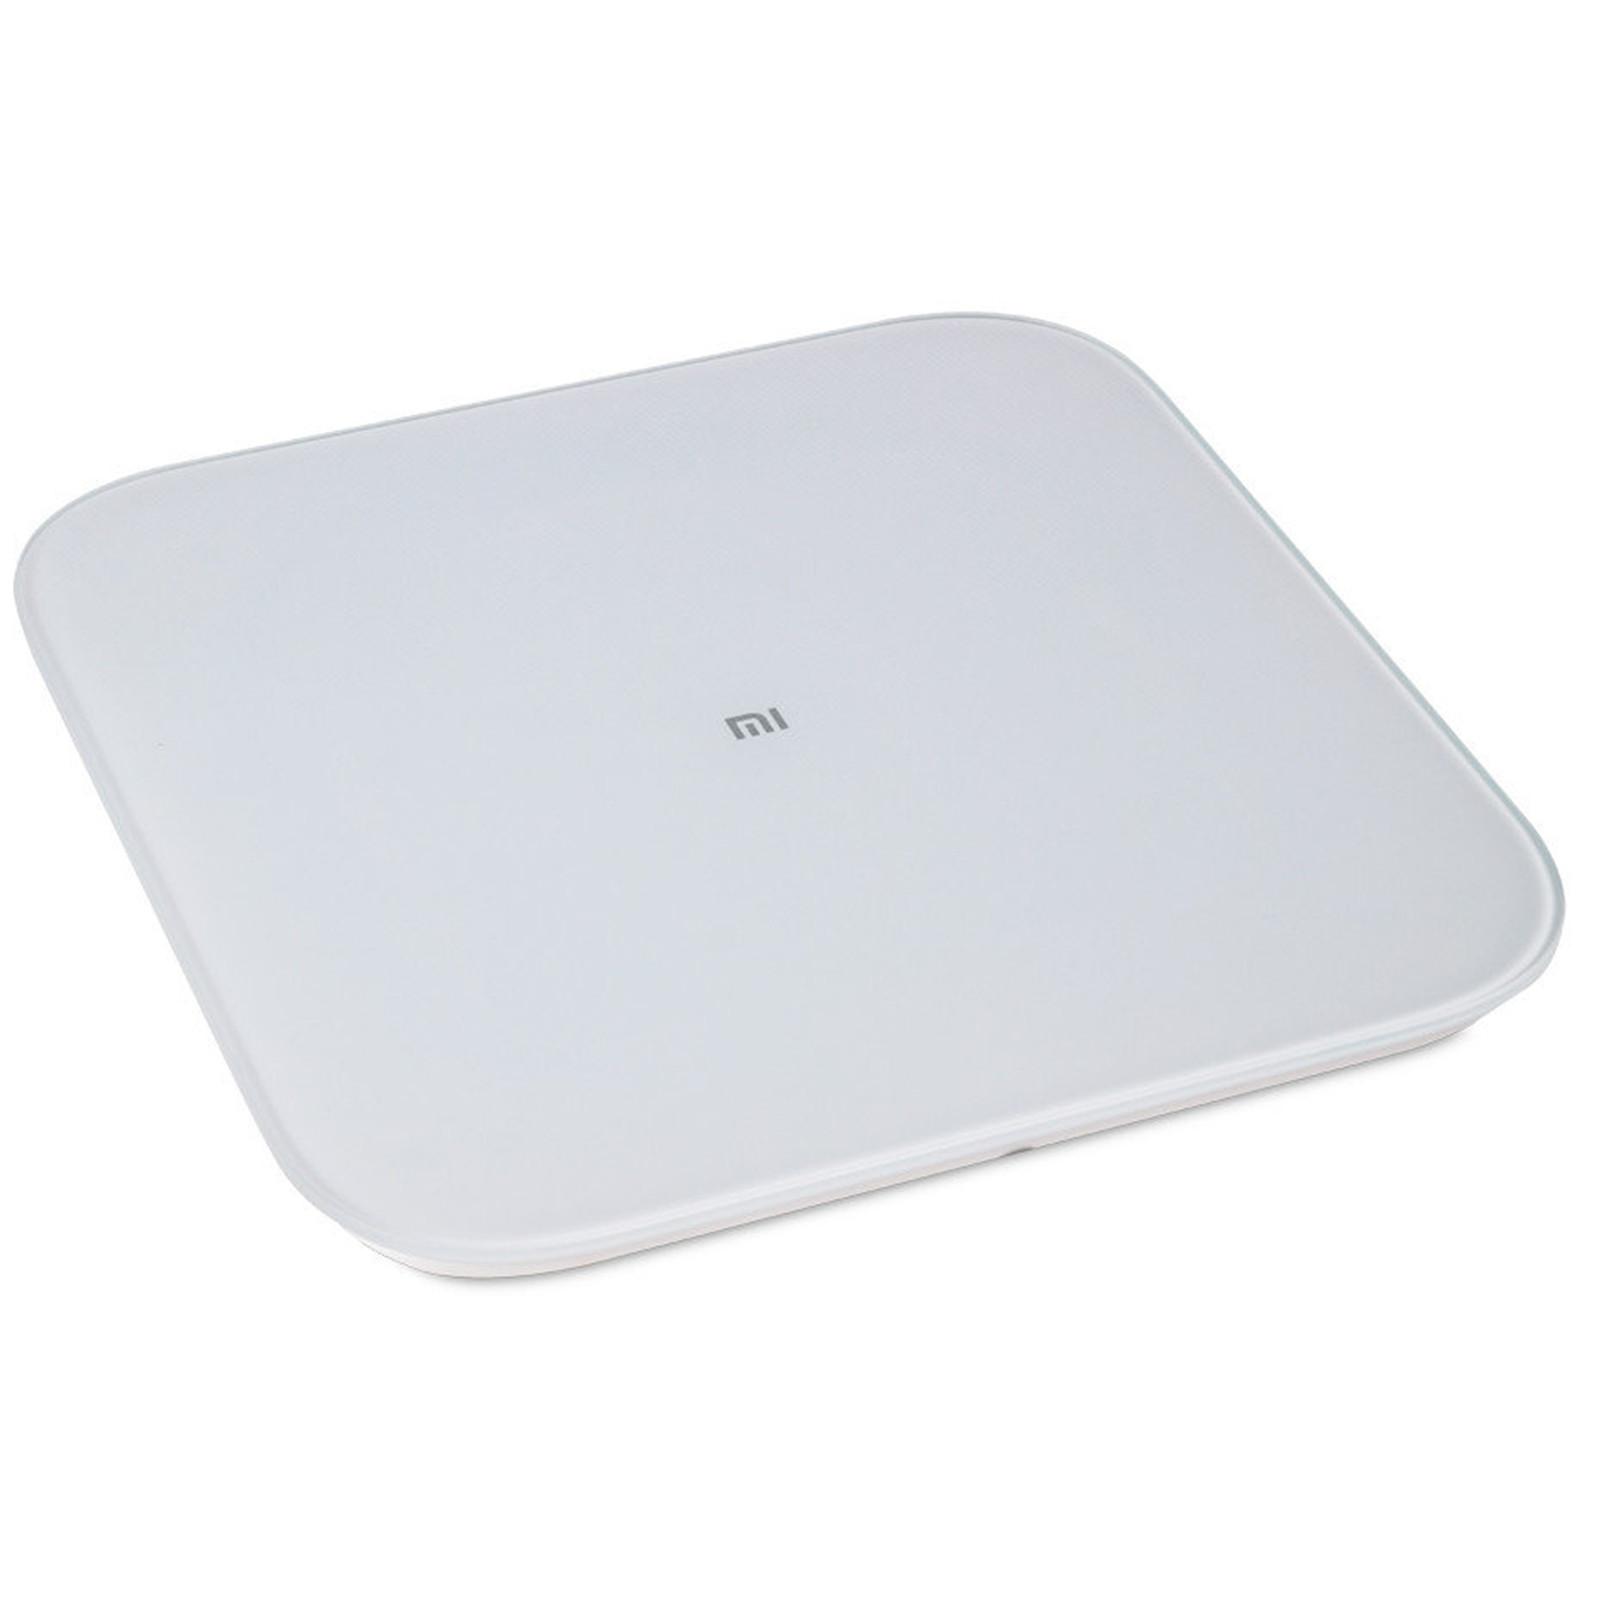 Mi Smart Scale 2 Ψηφιακή Ζυγαριά White NUN4056GL image